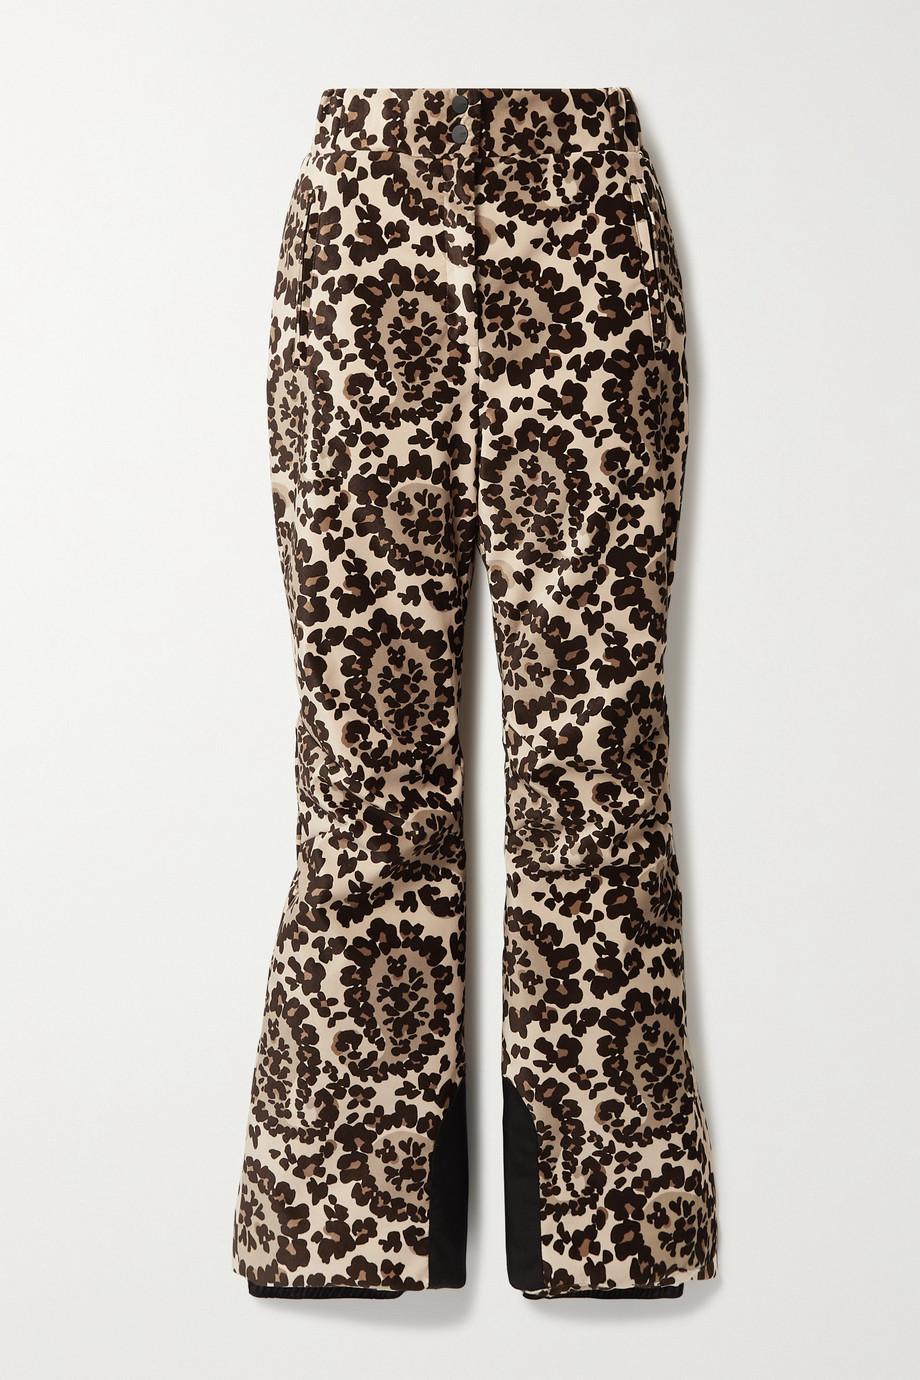 Fendi Pantalon de ski bootcut en velours imprimé